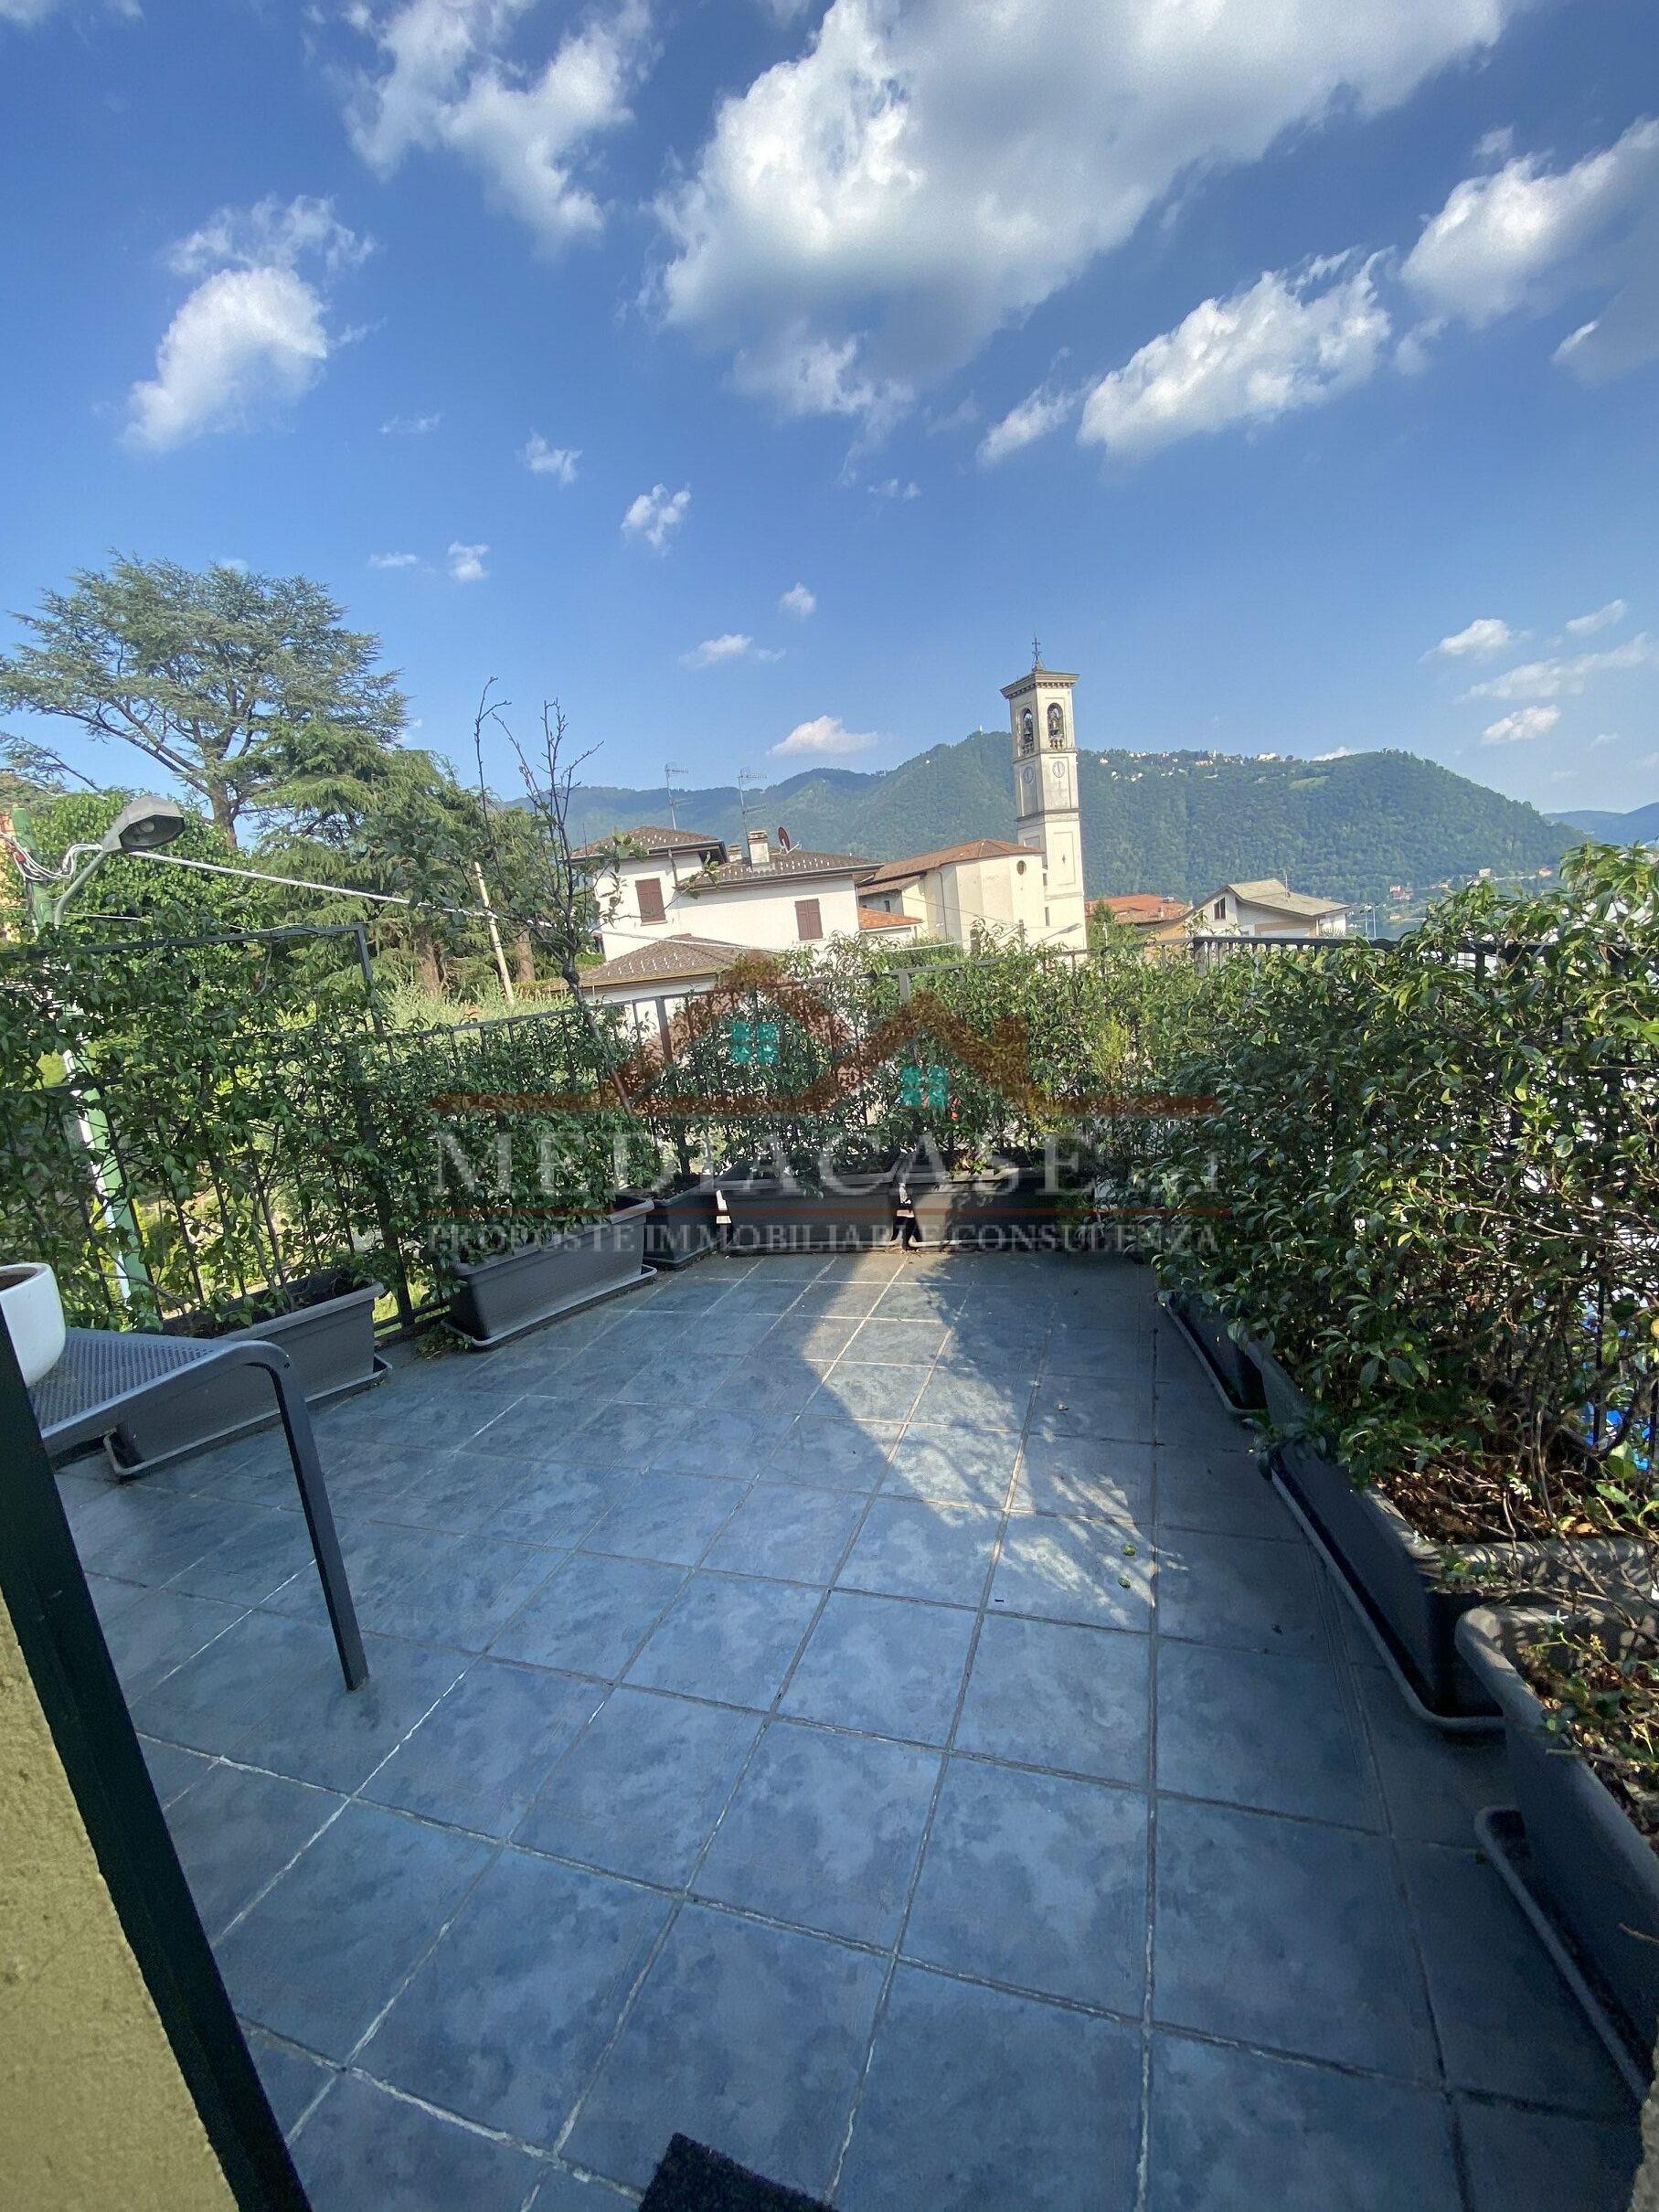 Cernobbio.....Tre locali,doppi servizi,posti auto,terrazzo vista lago!!!